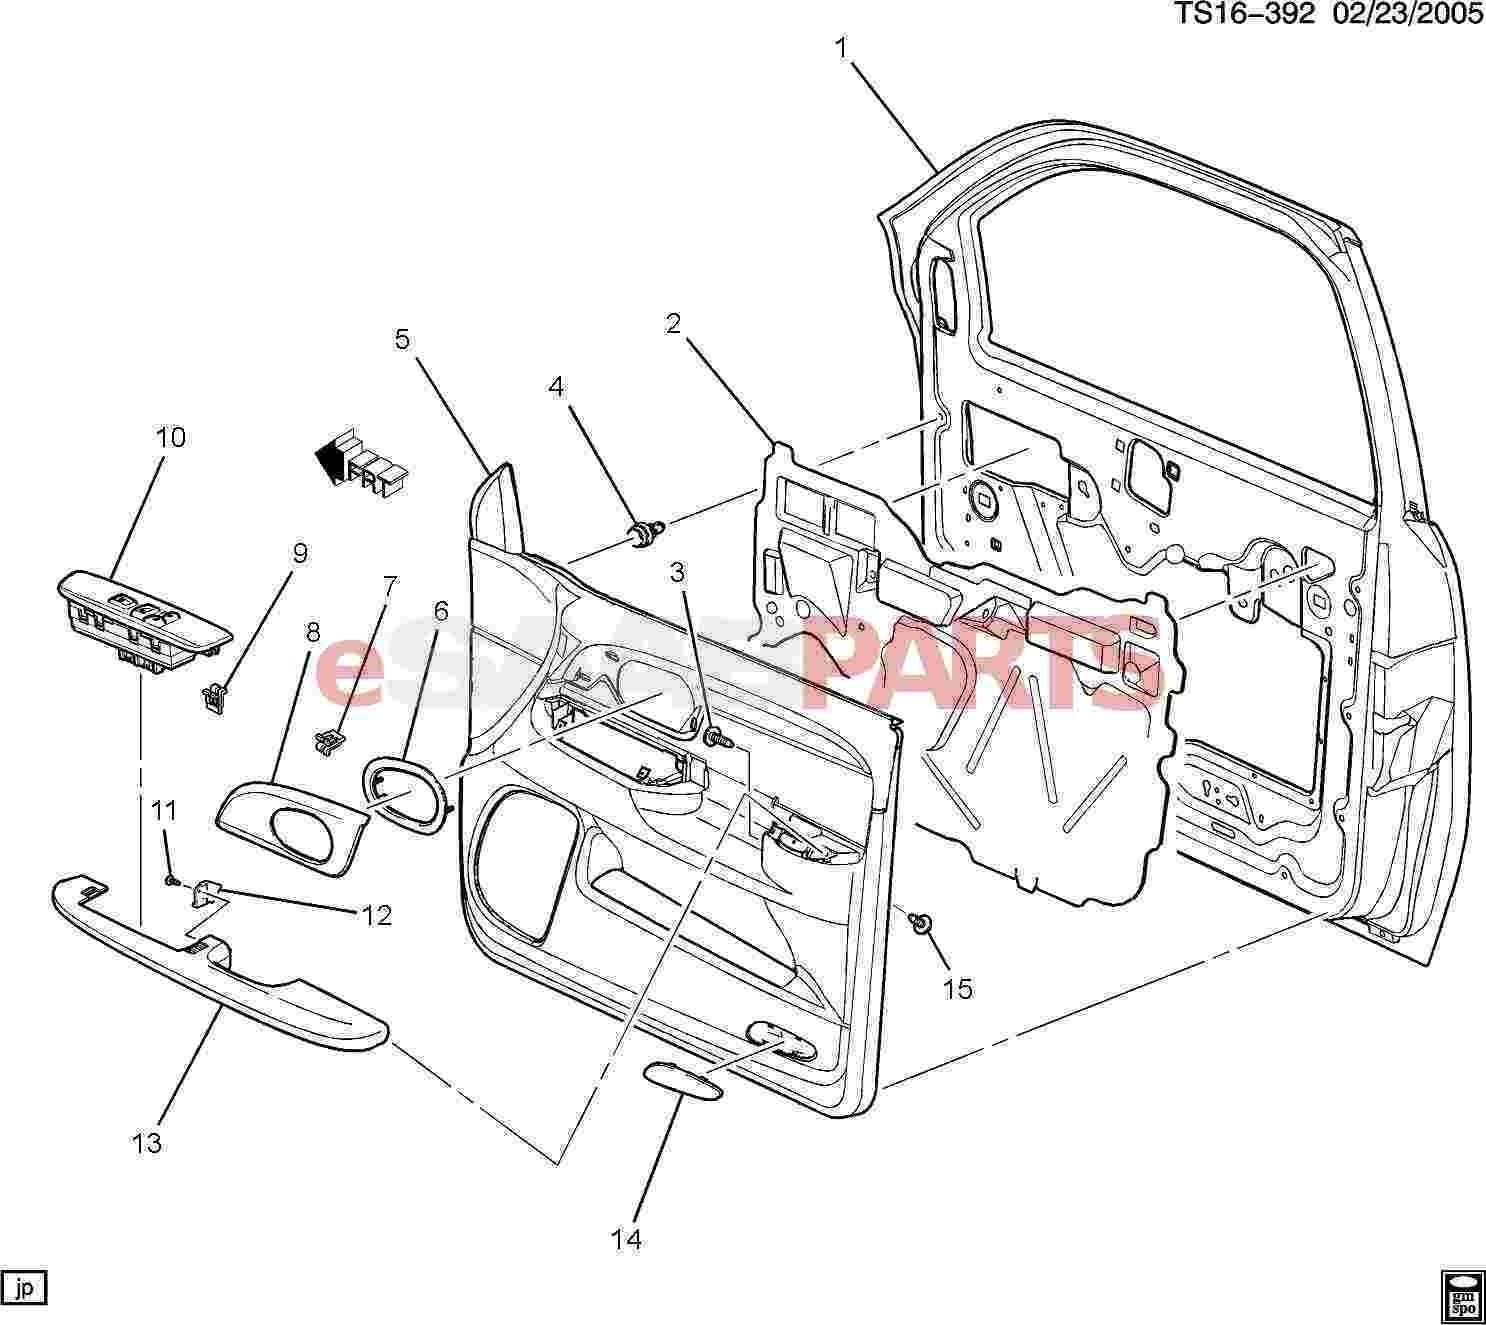 Car Undercarriage Parts Diagram Exterior Car Parts Diagram Esaabparts Saab 9 7x Car Body Internal Of Car Undercarriage Parts Diagram